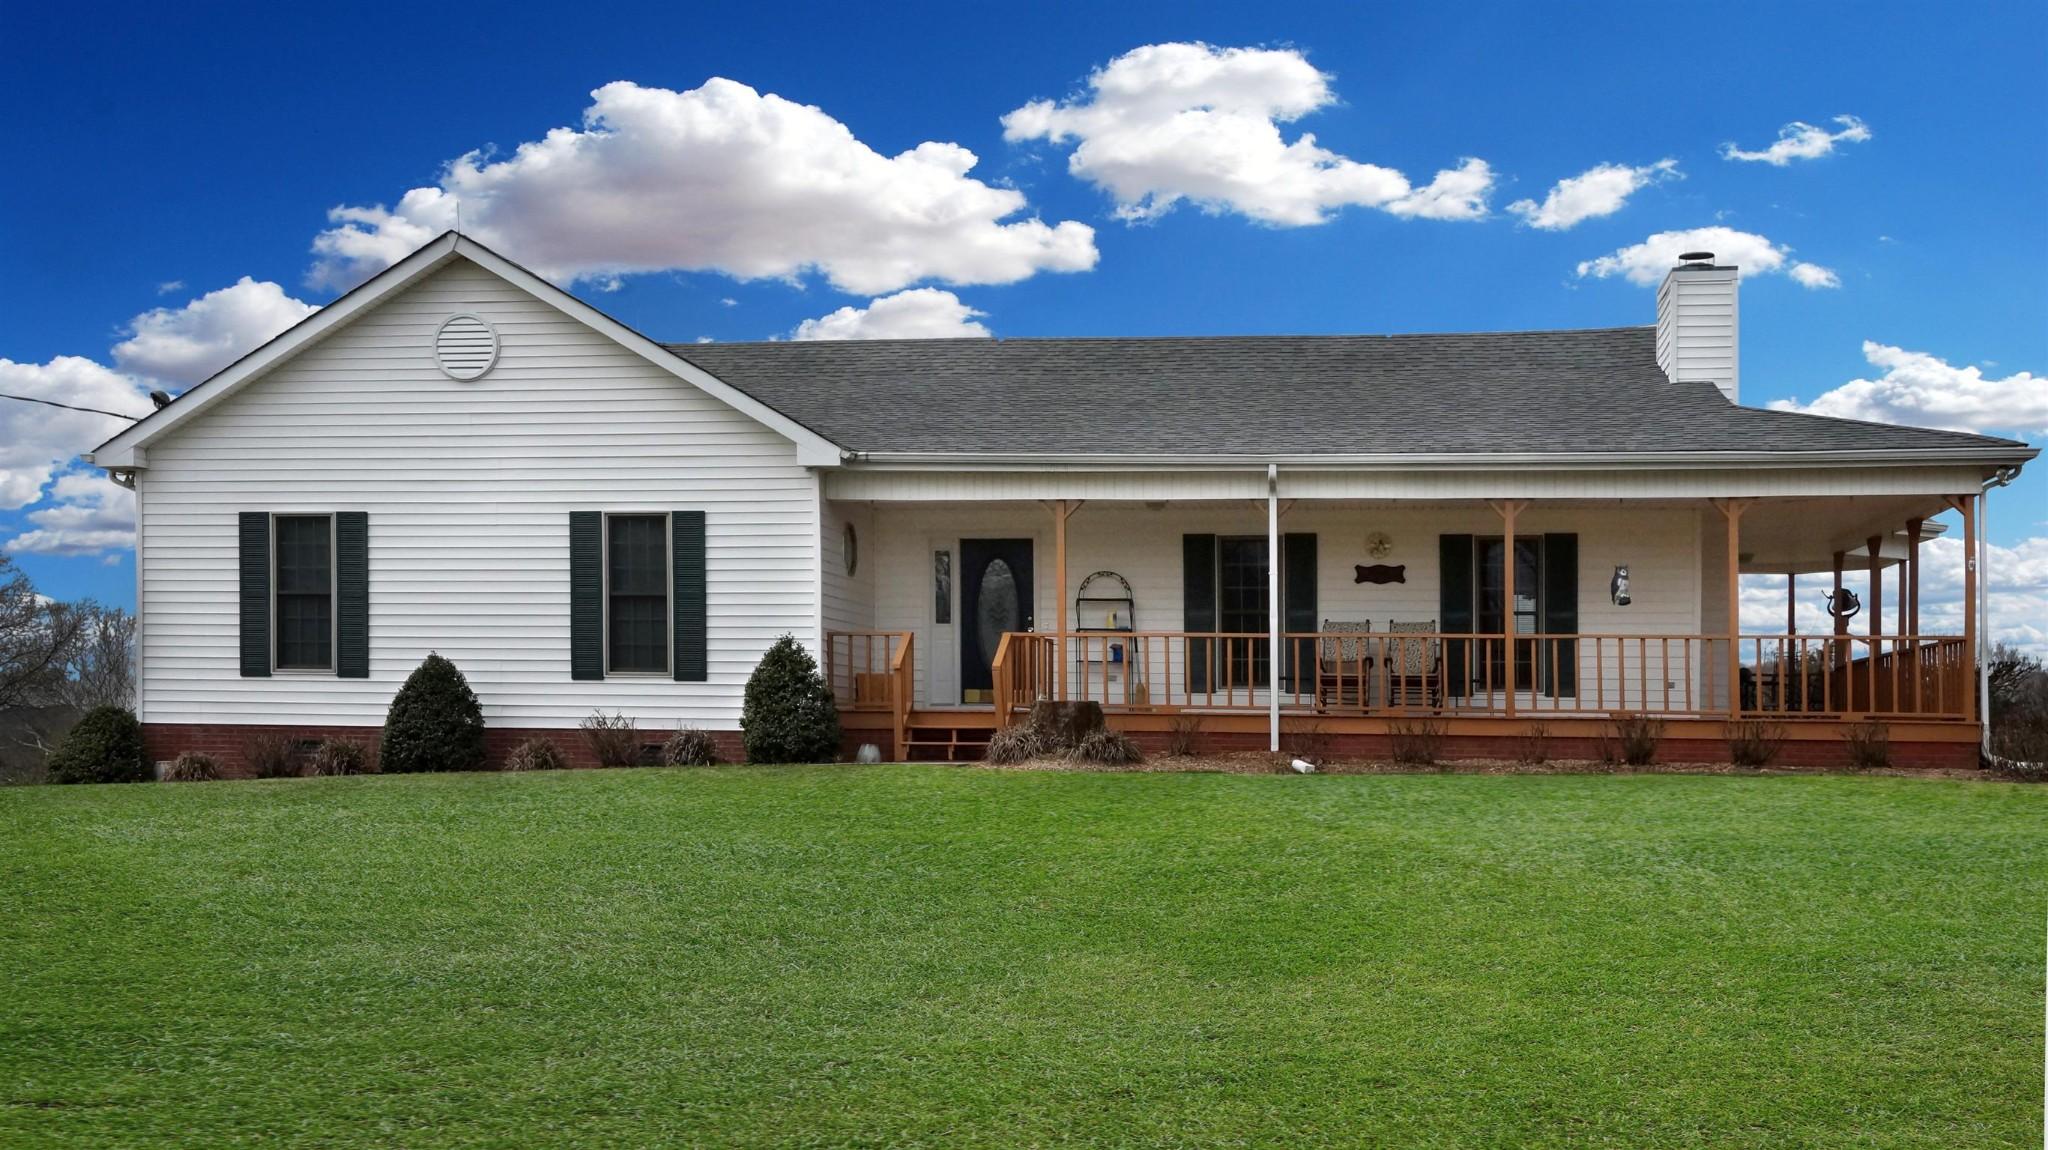 505 Lebanon Pike, Hartsville, TN 37074 - Hartsville, TN real estate listing